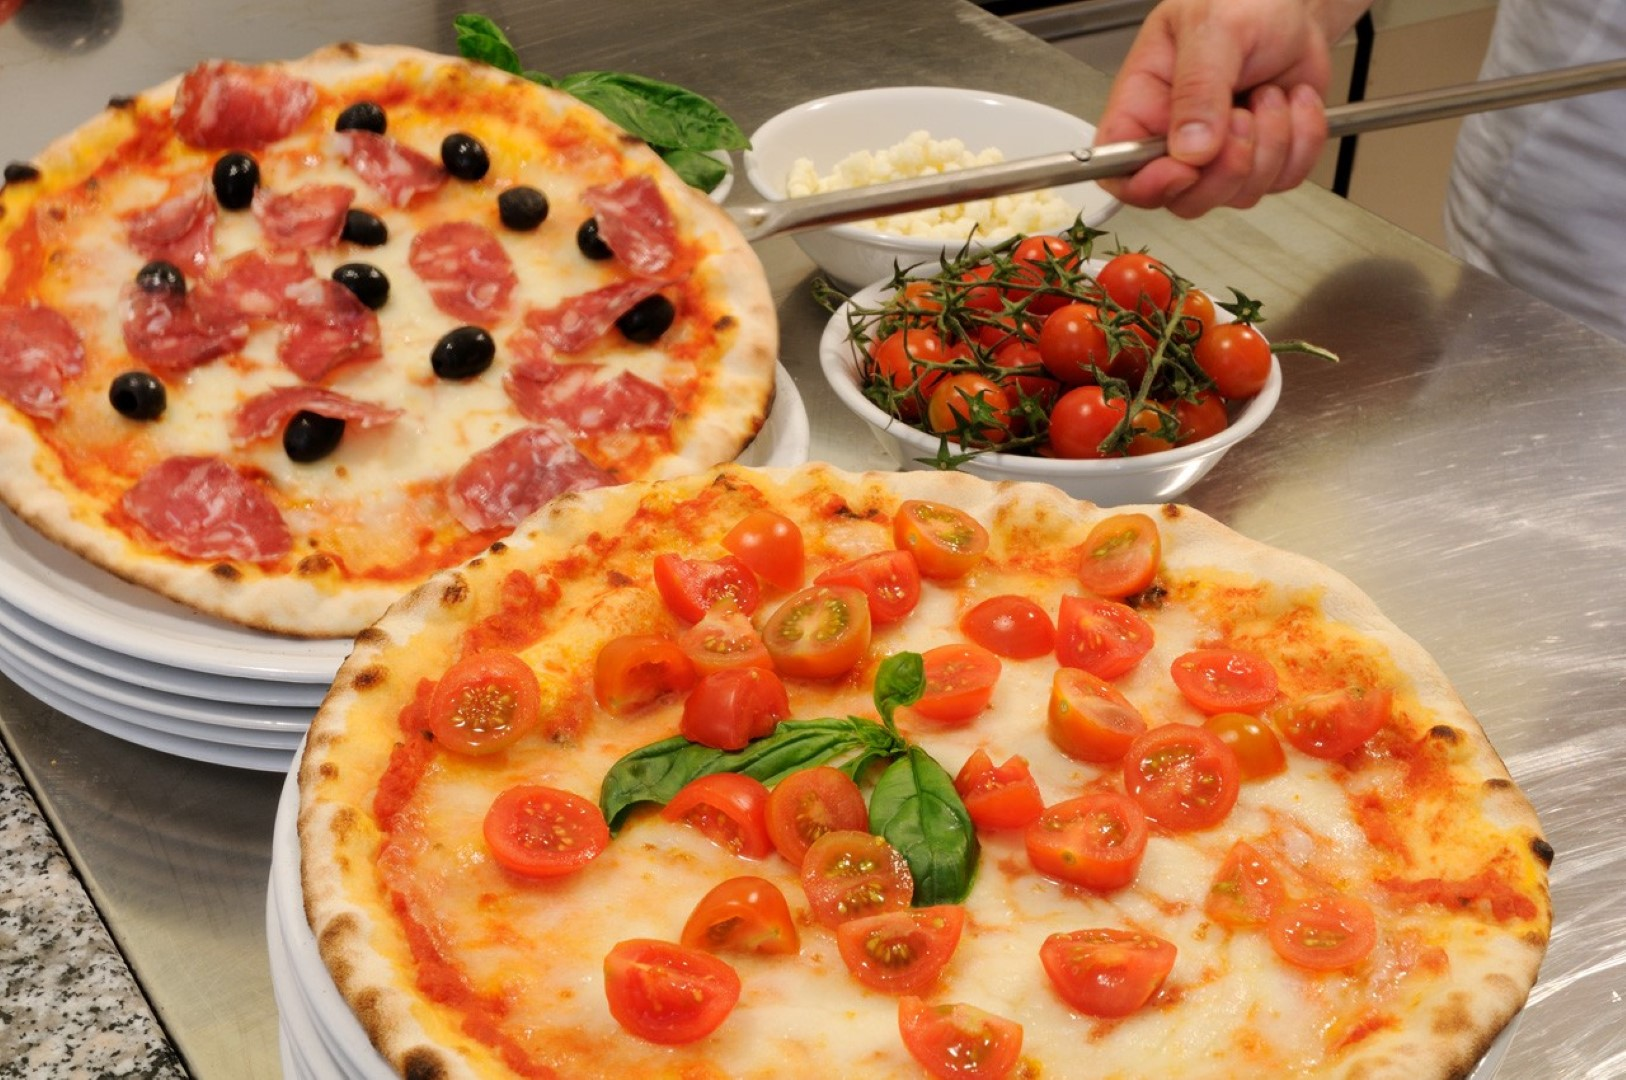 Sabato 16 novembre Pizzeria a Porta Sant'Andrea